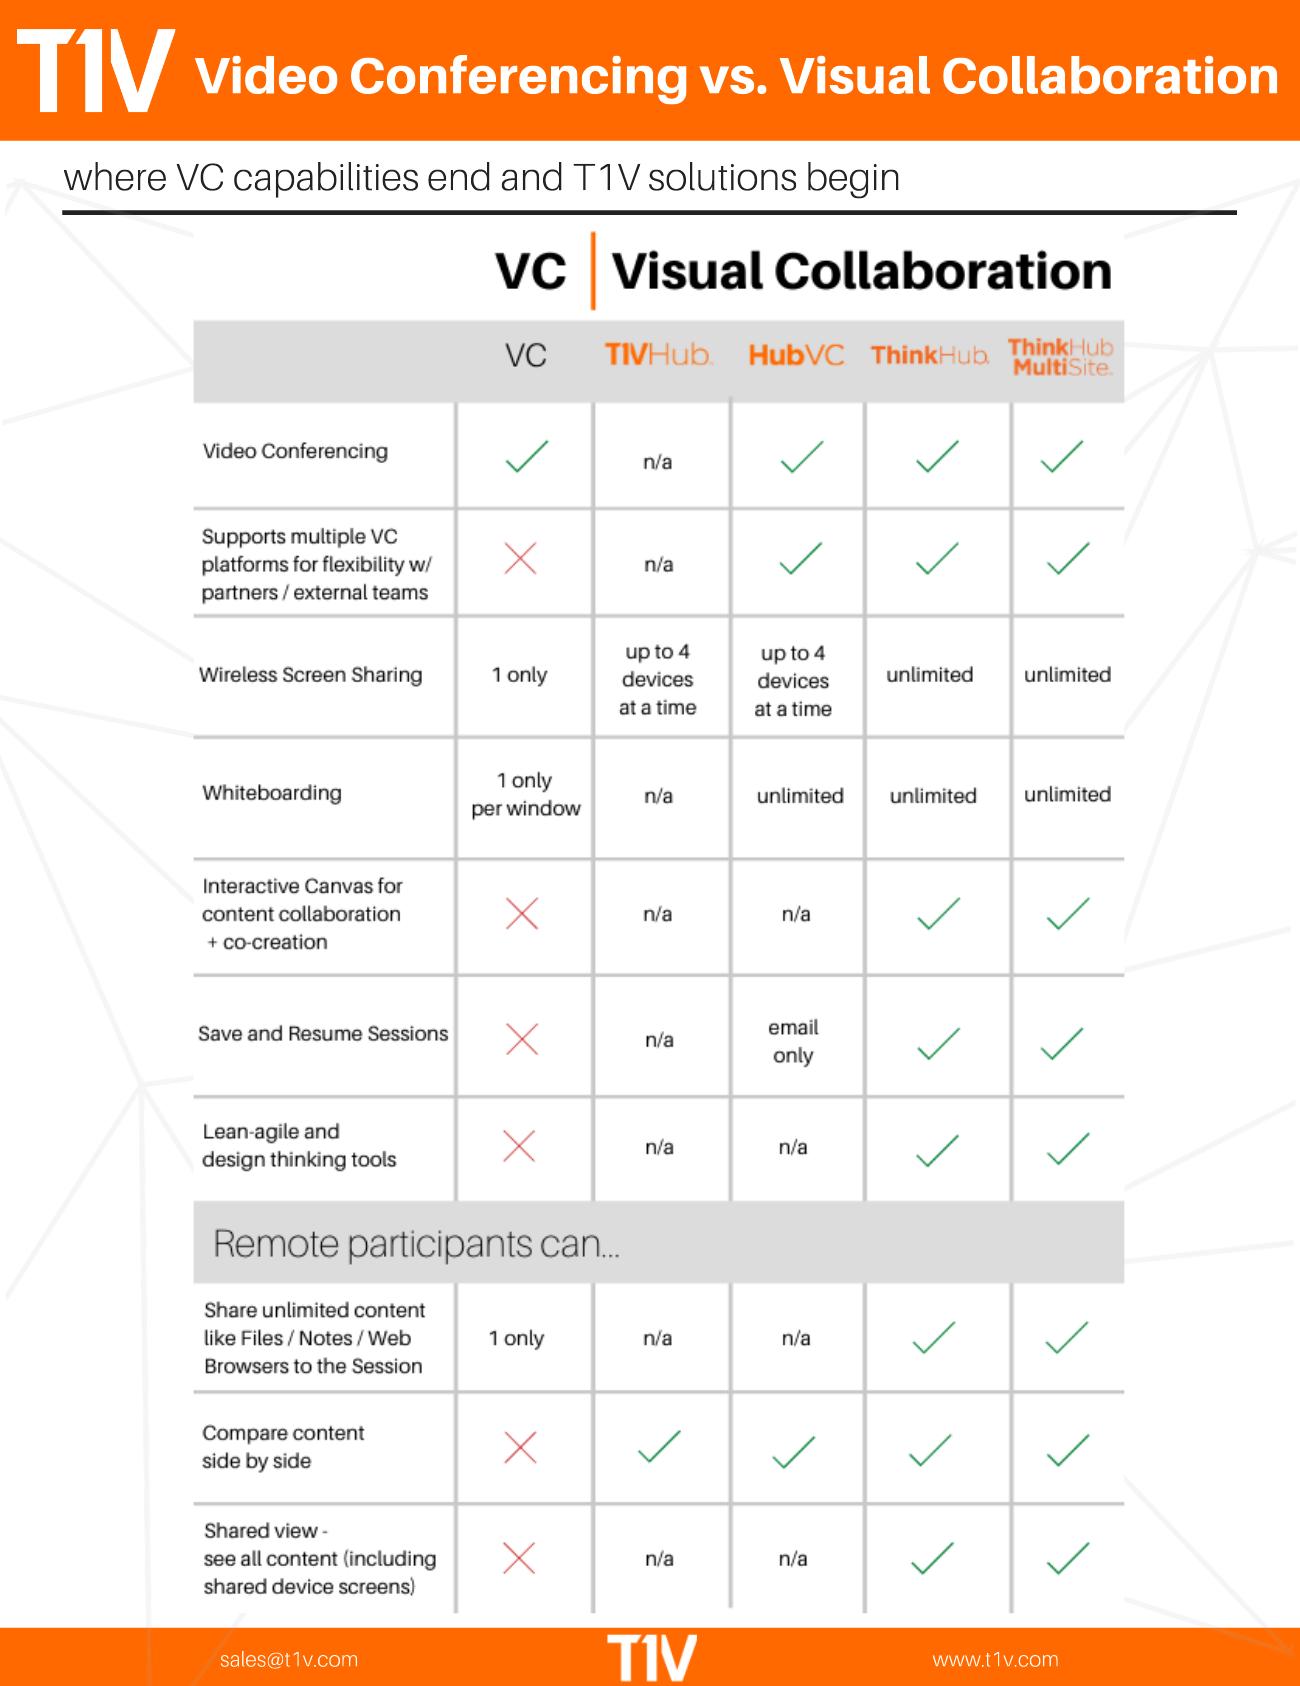 Video Conferencing vs. Visual Collaboration